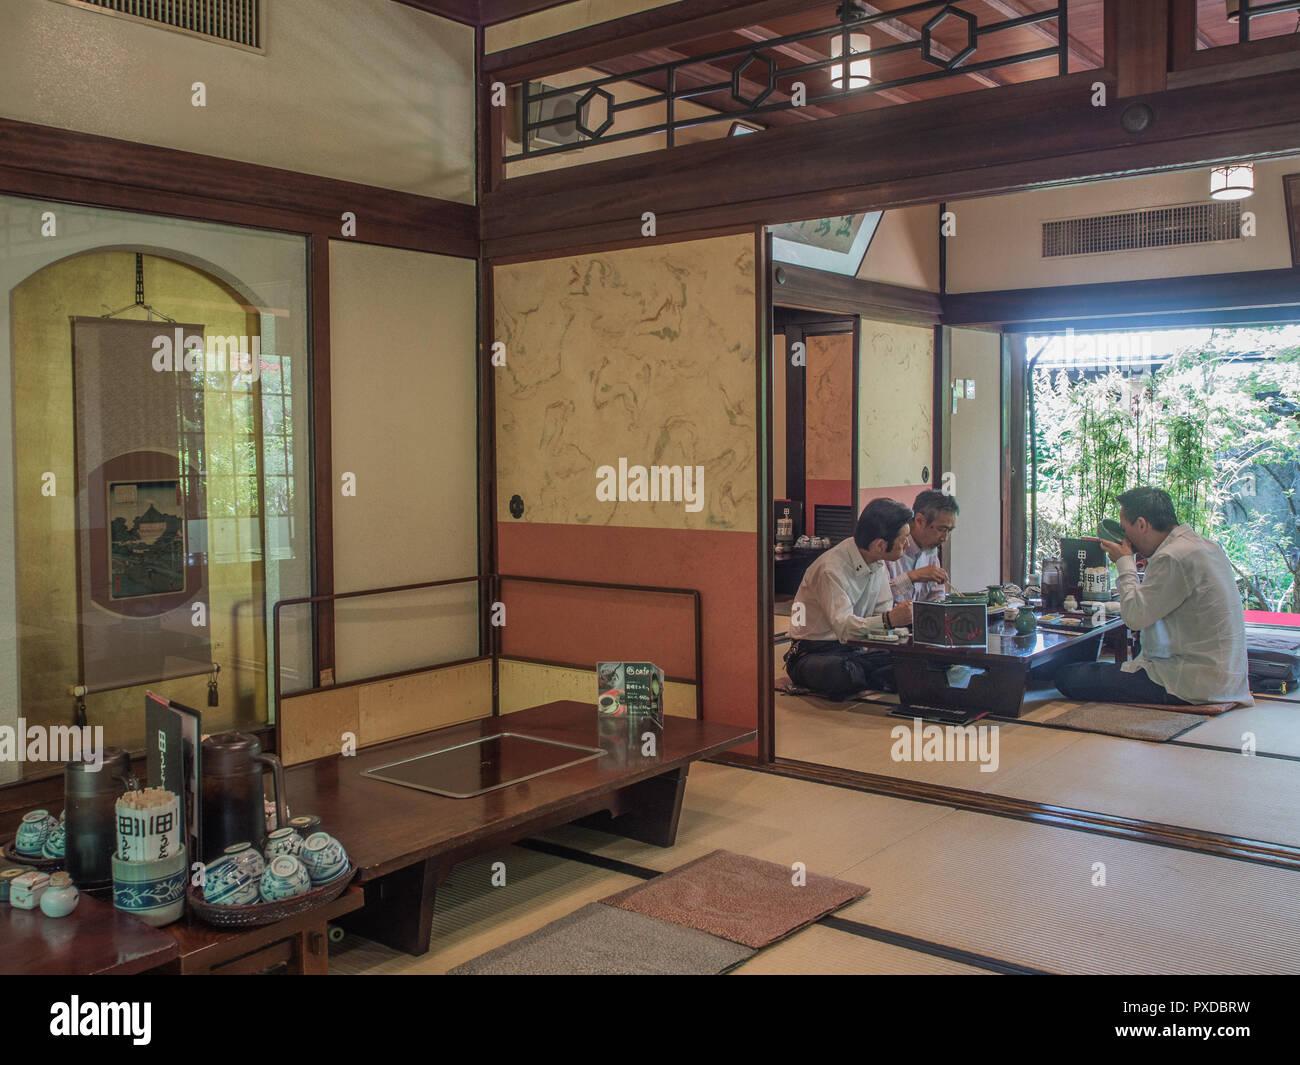 3 Three men eating meal, sitting cross legged at low table,  tatami floor, restaurant Udon Yamadaya, Takamatsu, Kagawa, Japan Stock Photo